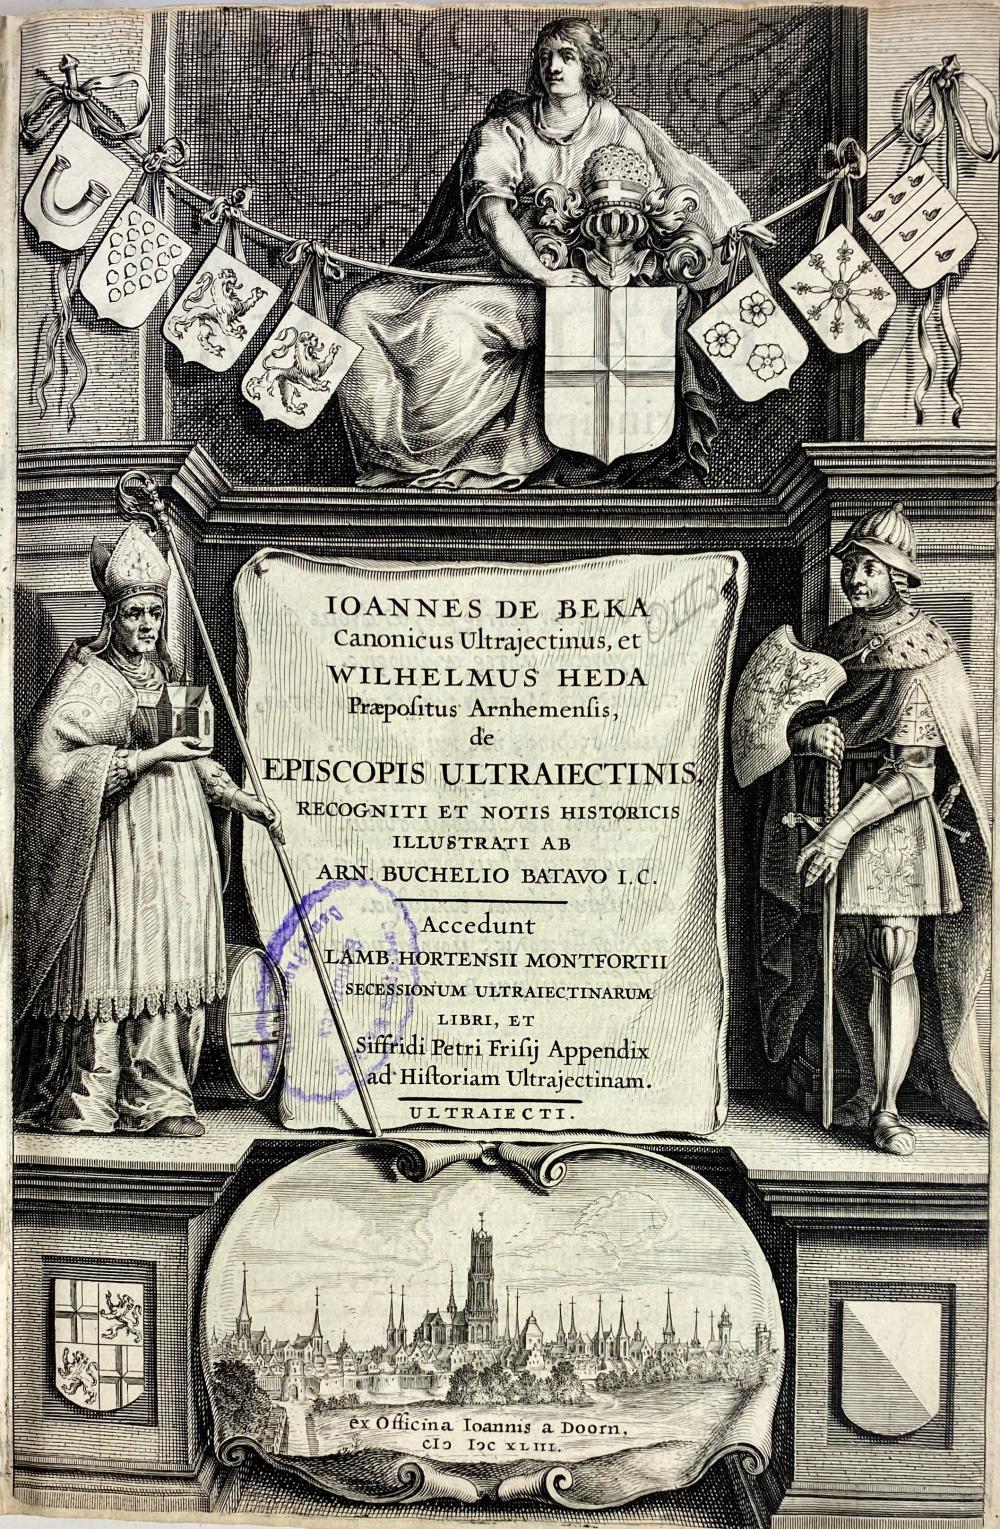 CHRONICLES -- BEKA, J. de & W. HEDA. De episcopis Ultraiectinis, rec. et notis